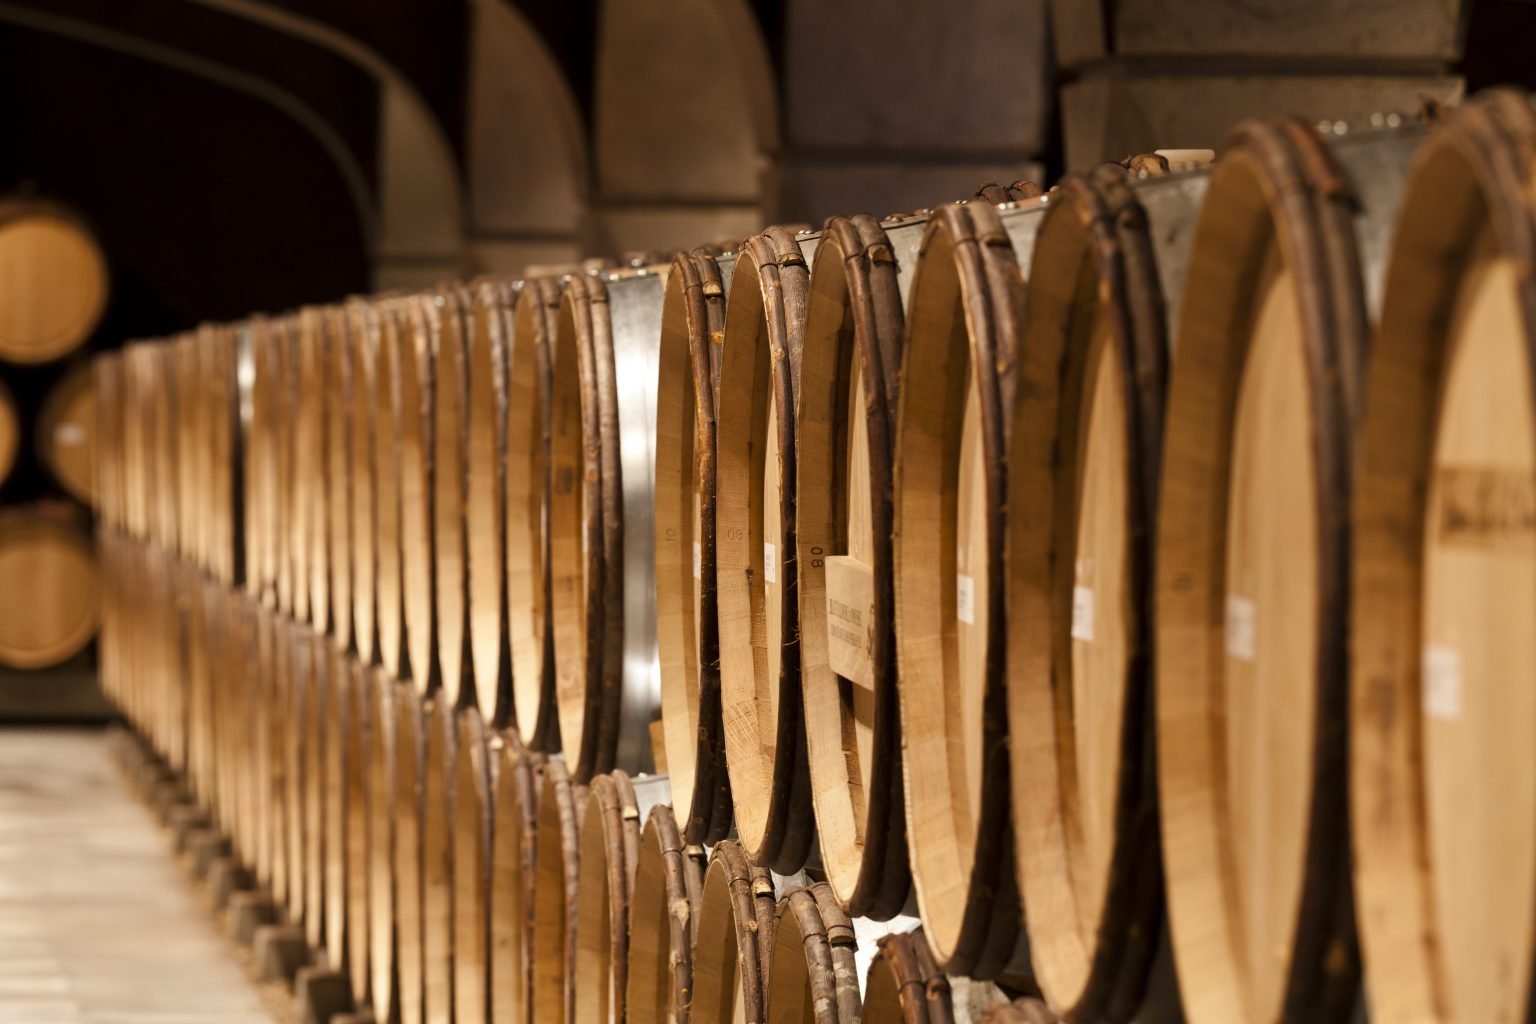 Barrels of Burgundy